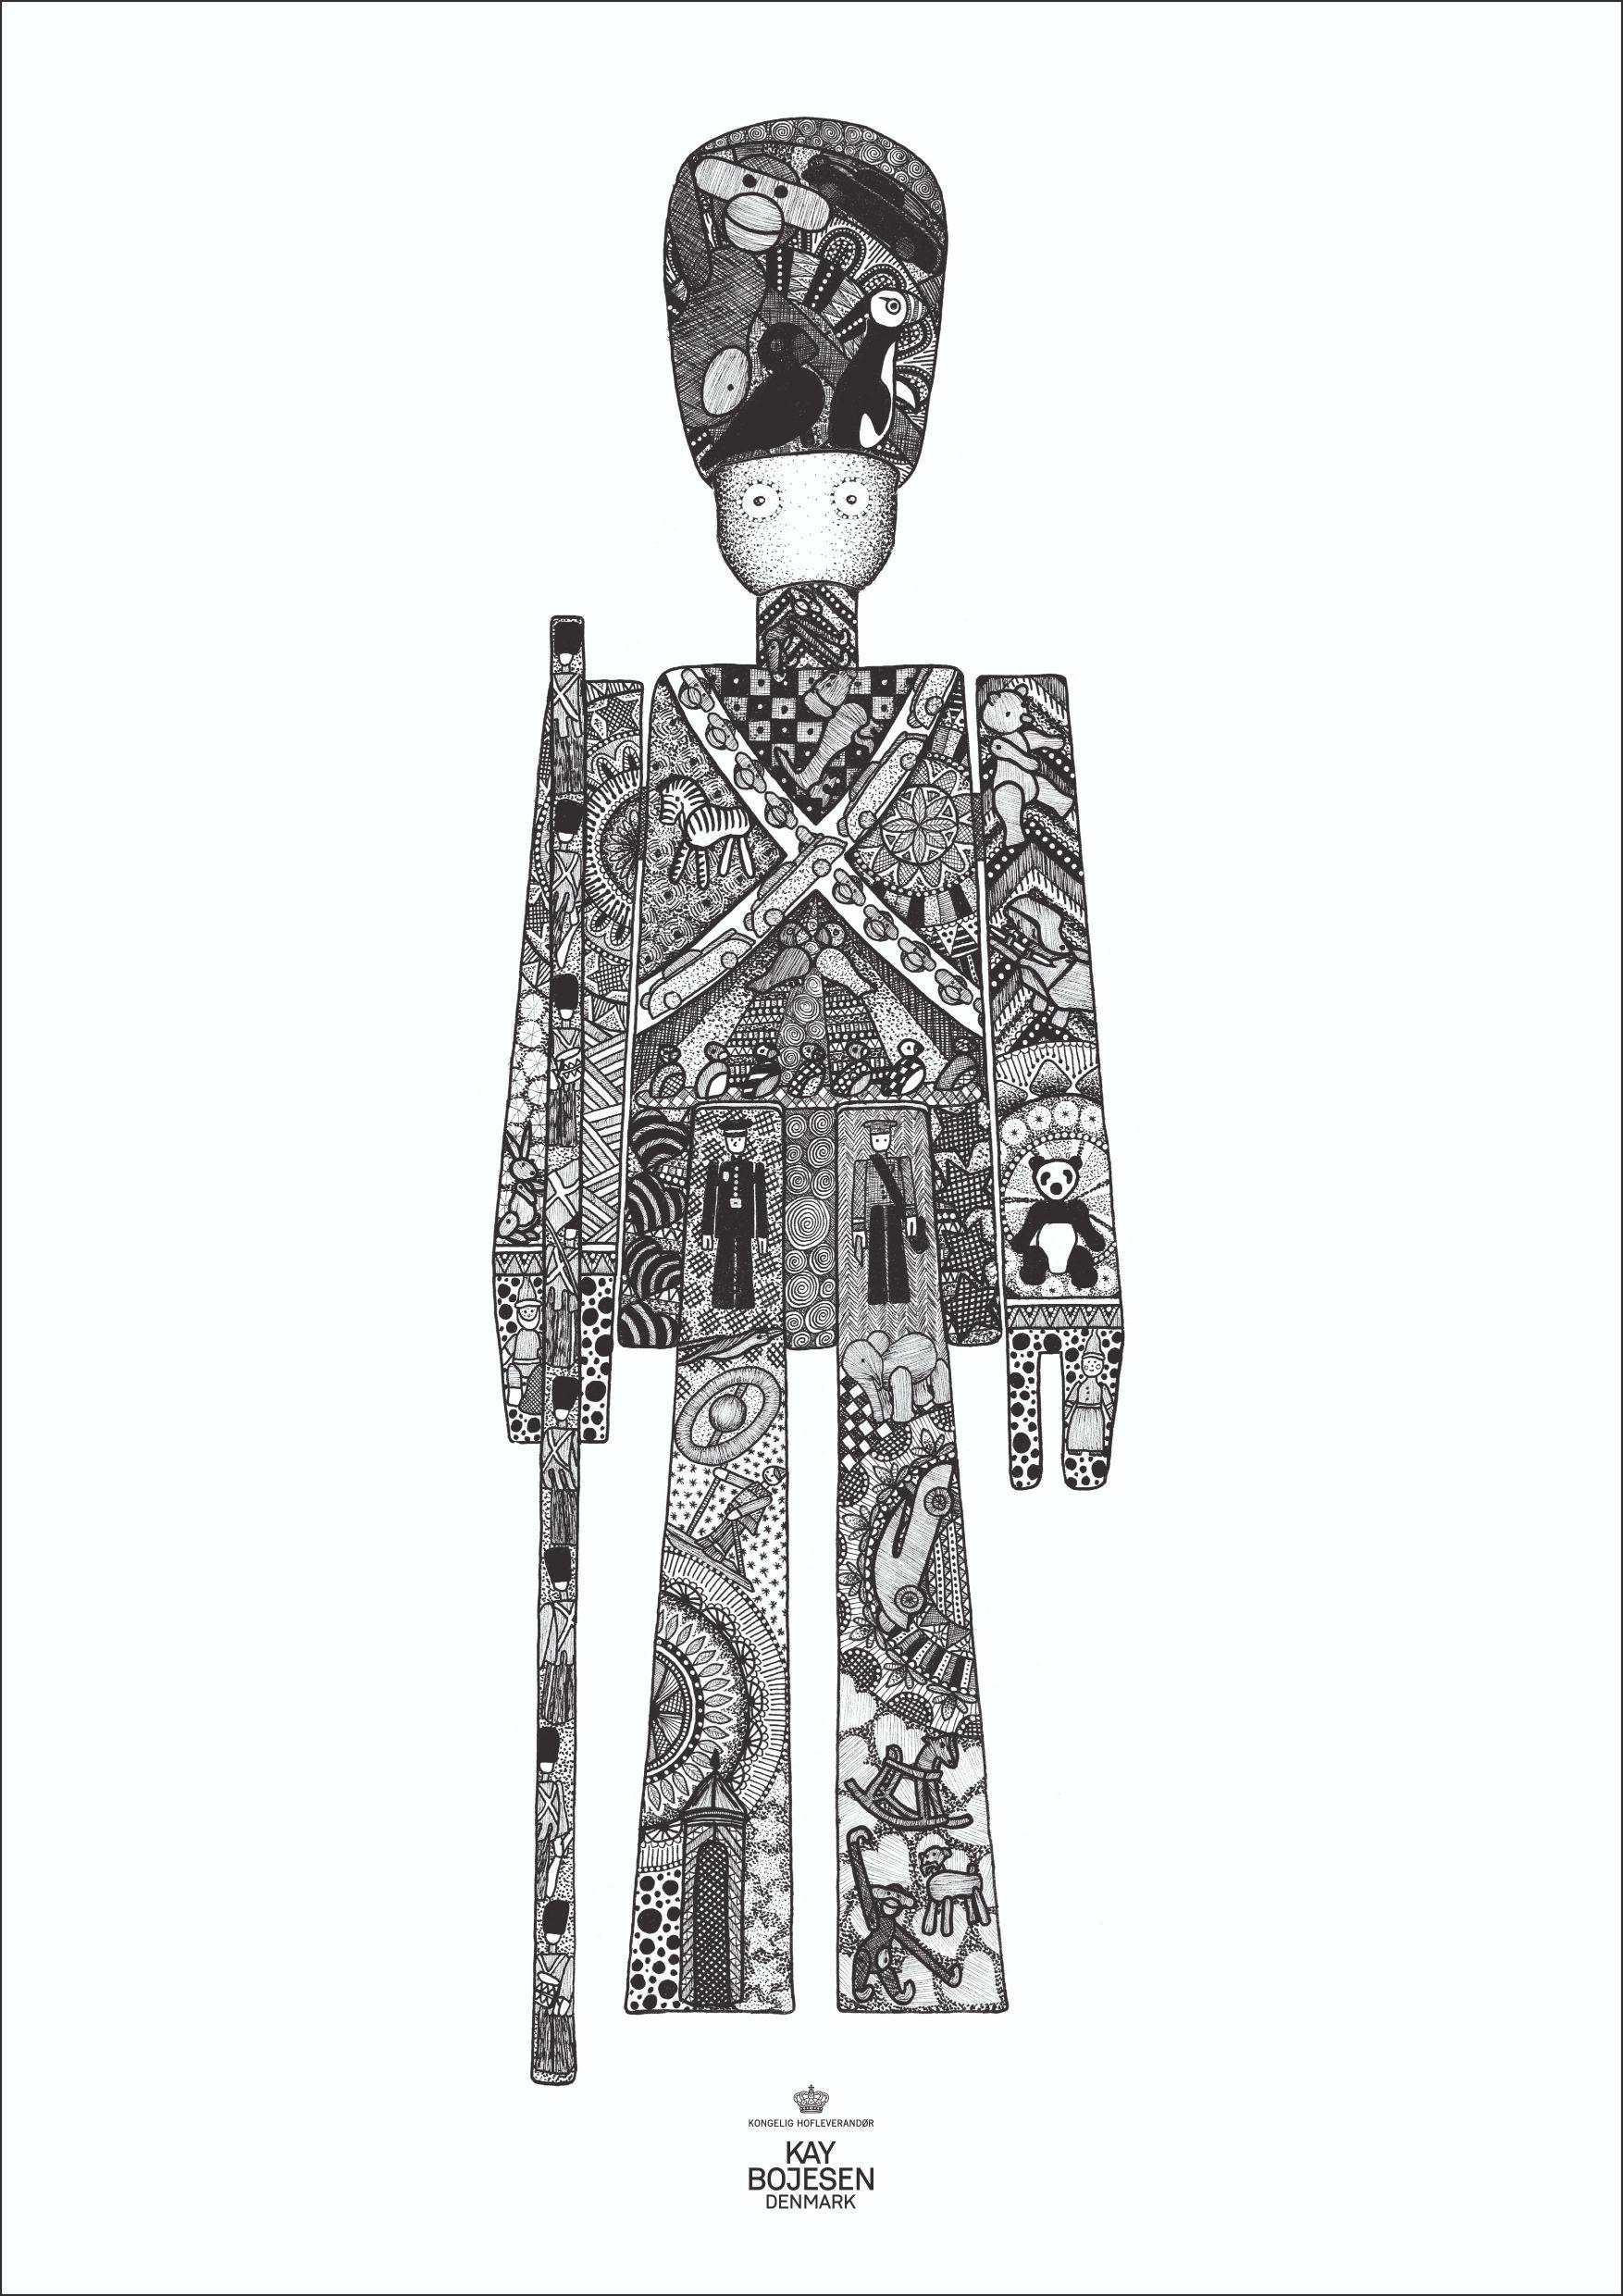 Kay Bojesen plakat, garder, 50x70 cm